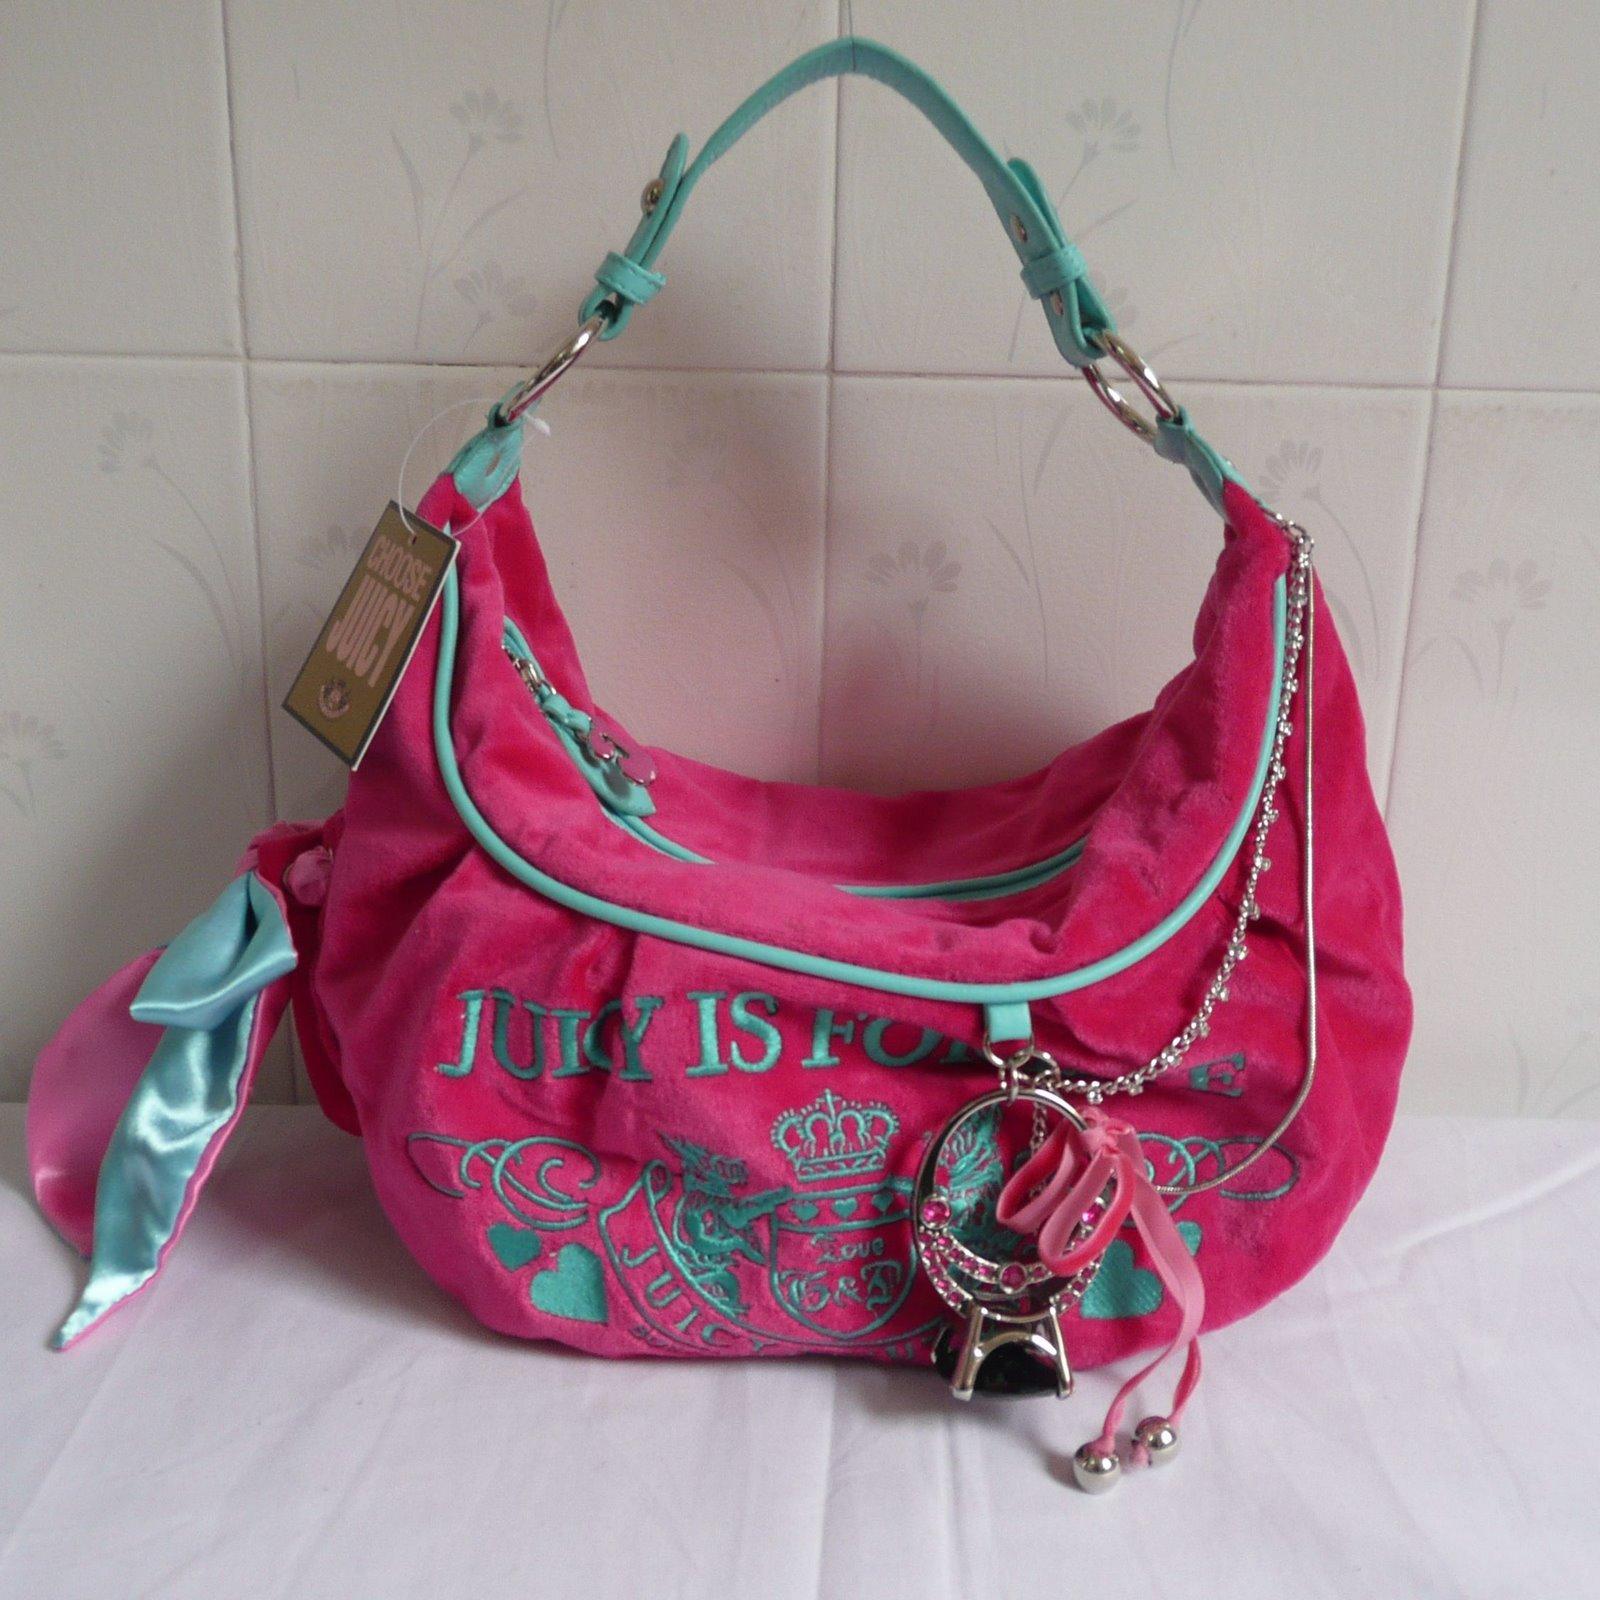 Juicy Couture  469 Bags Women's Tote Purse Handbags